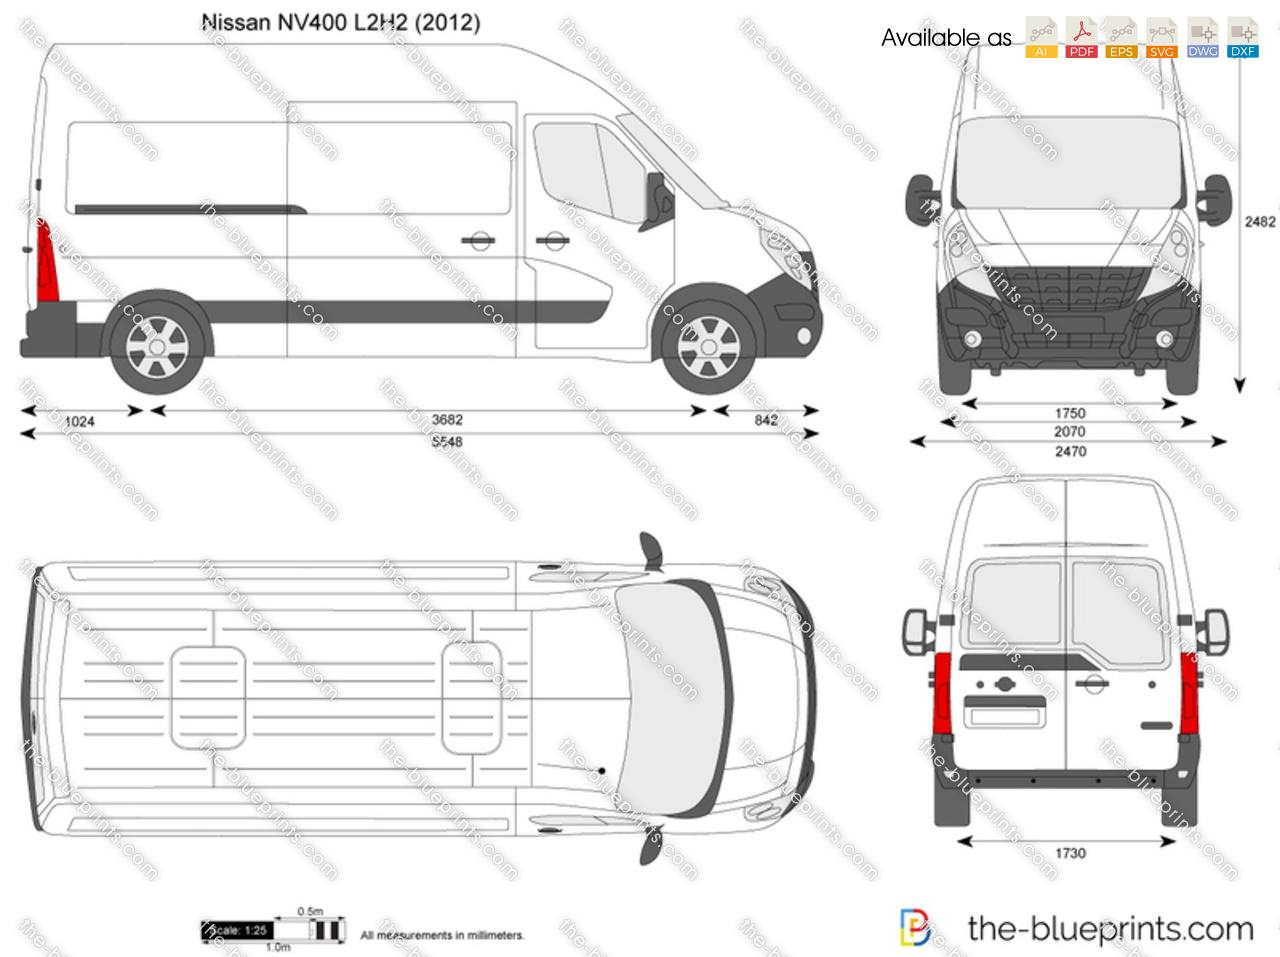 Nissan Nv400 L2h2 Vector Drawing